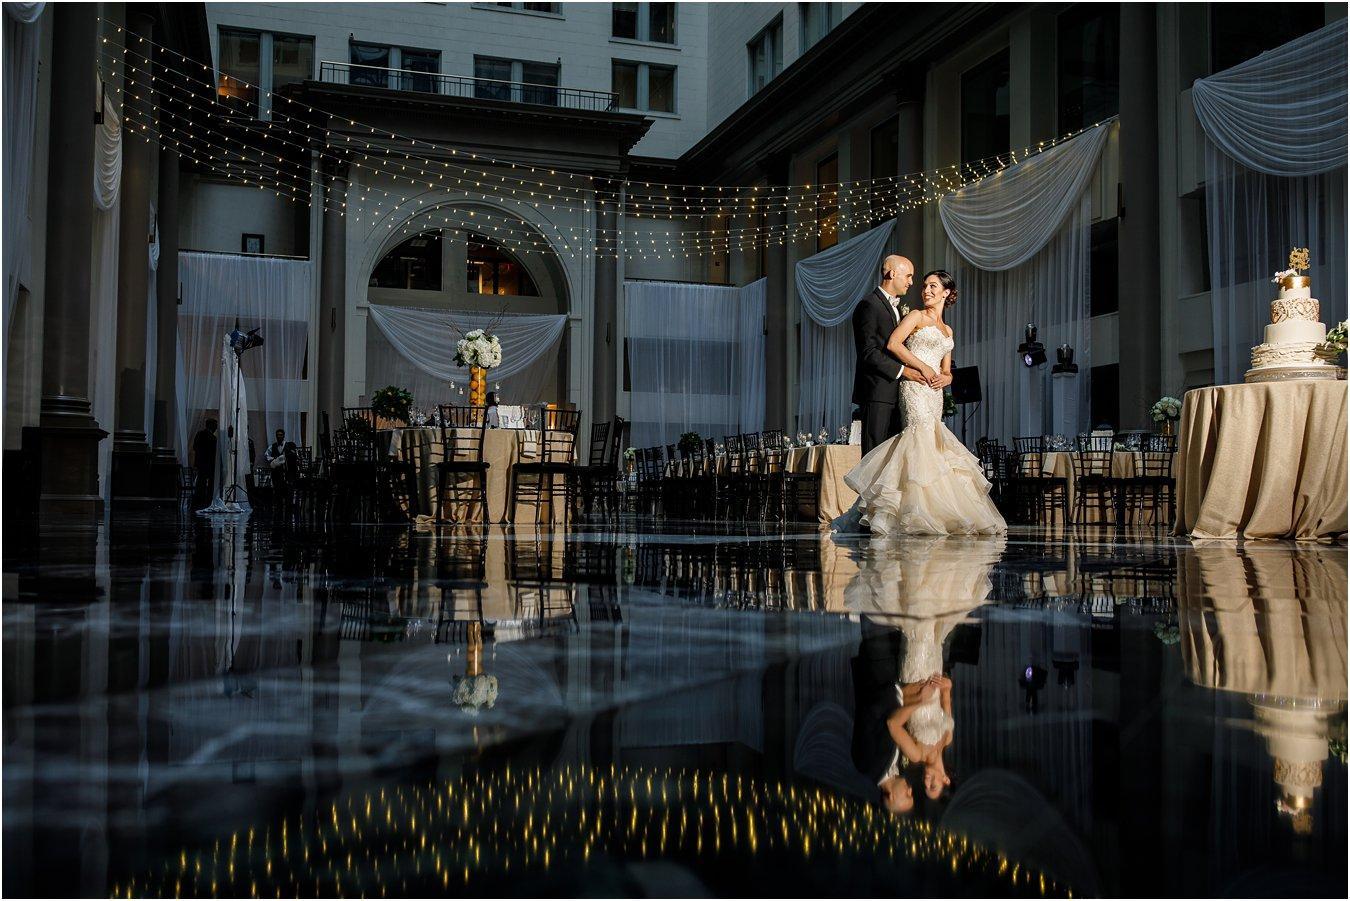 Italian Garden Wedding At The Atrium at Curtis Center Anastasia Romanova Photography Philly In Love Philadelphia Weddings Venues Vendors